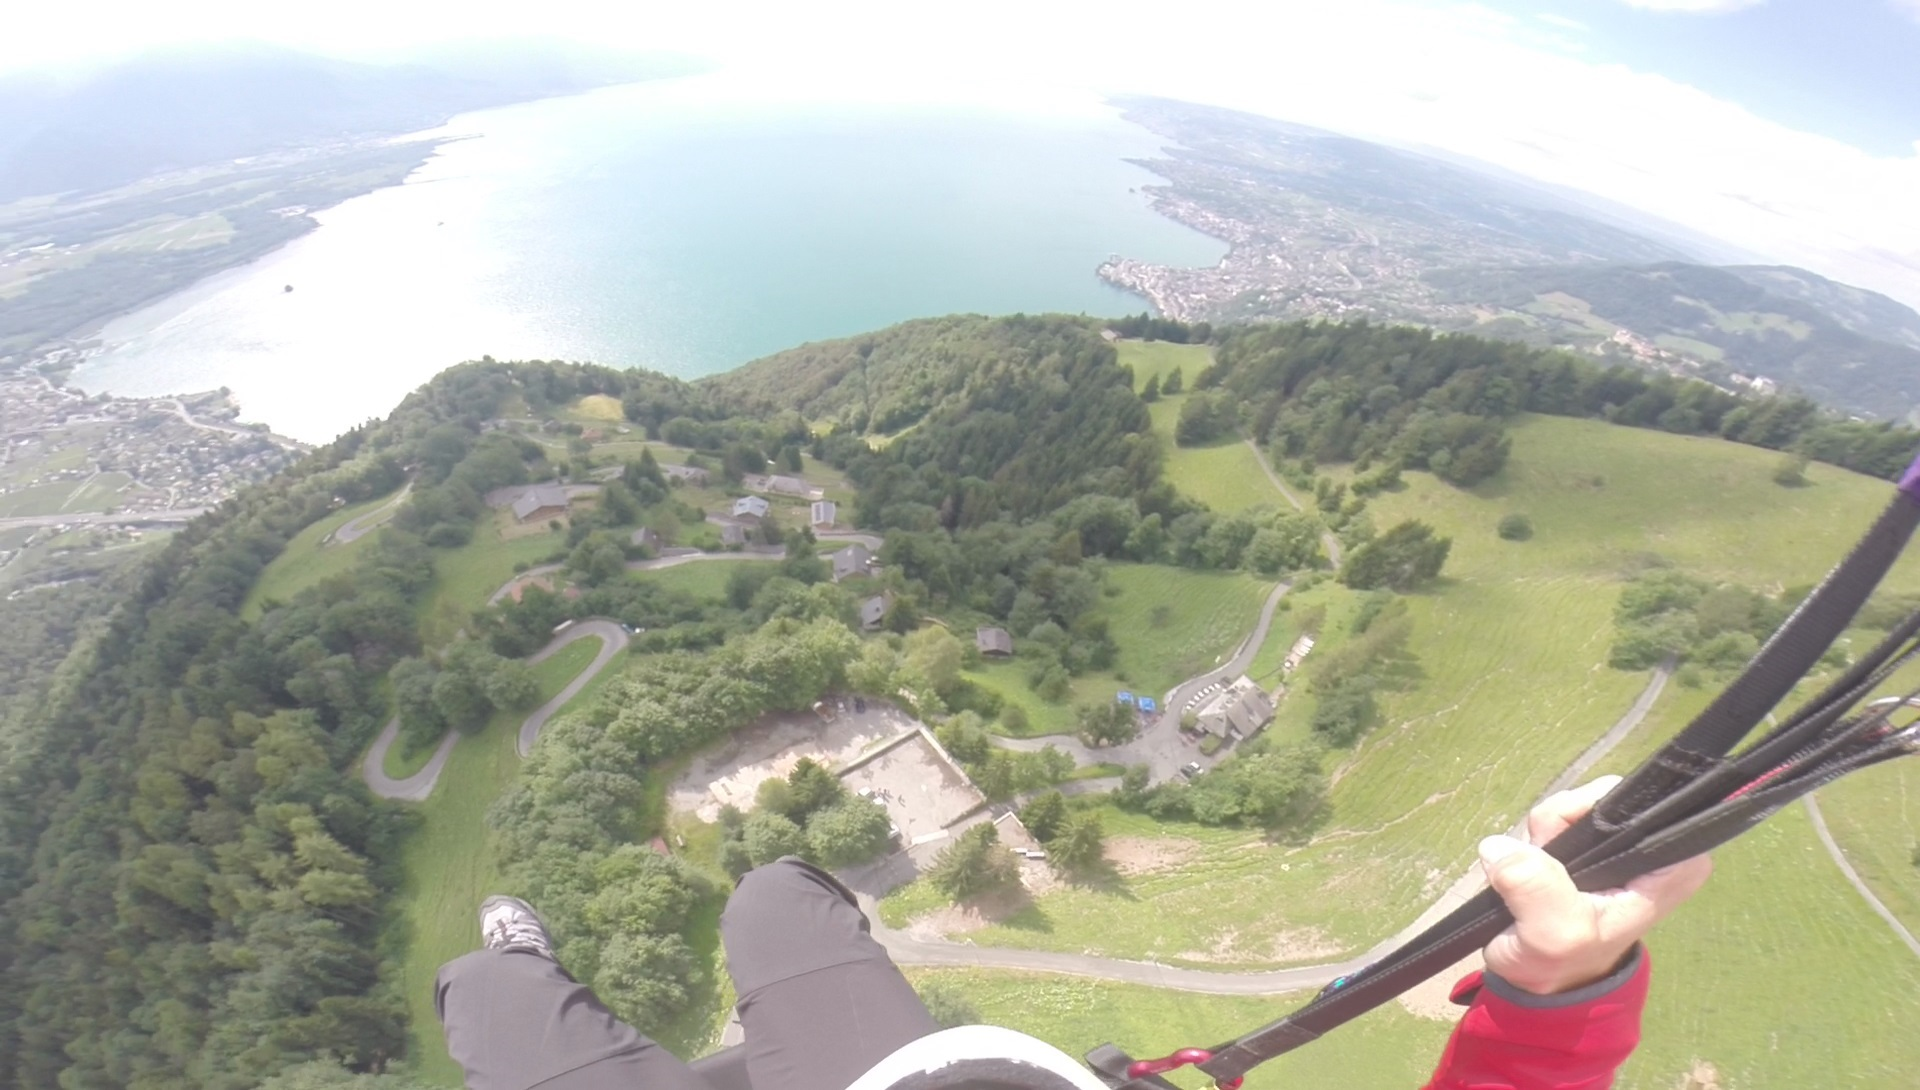 Paragliding at Sonchaux